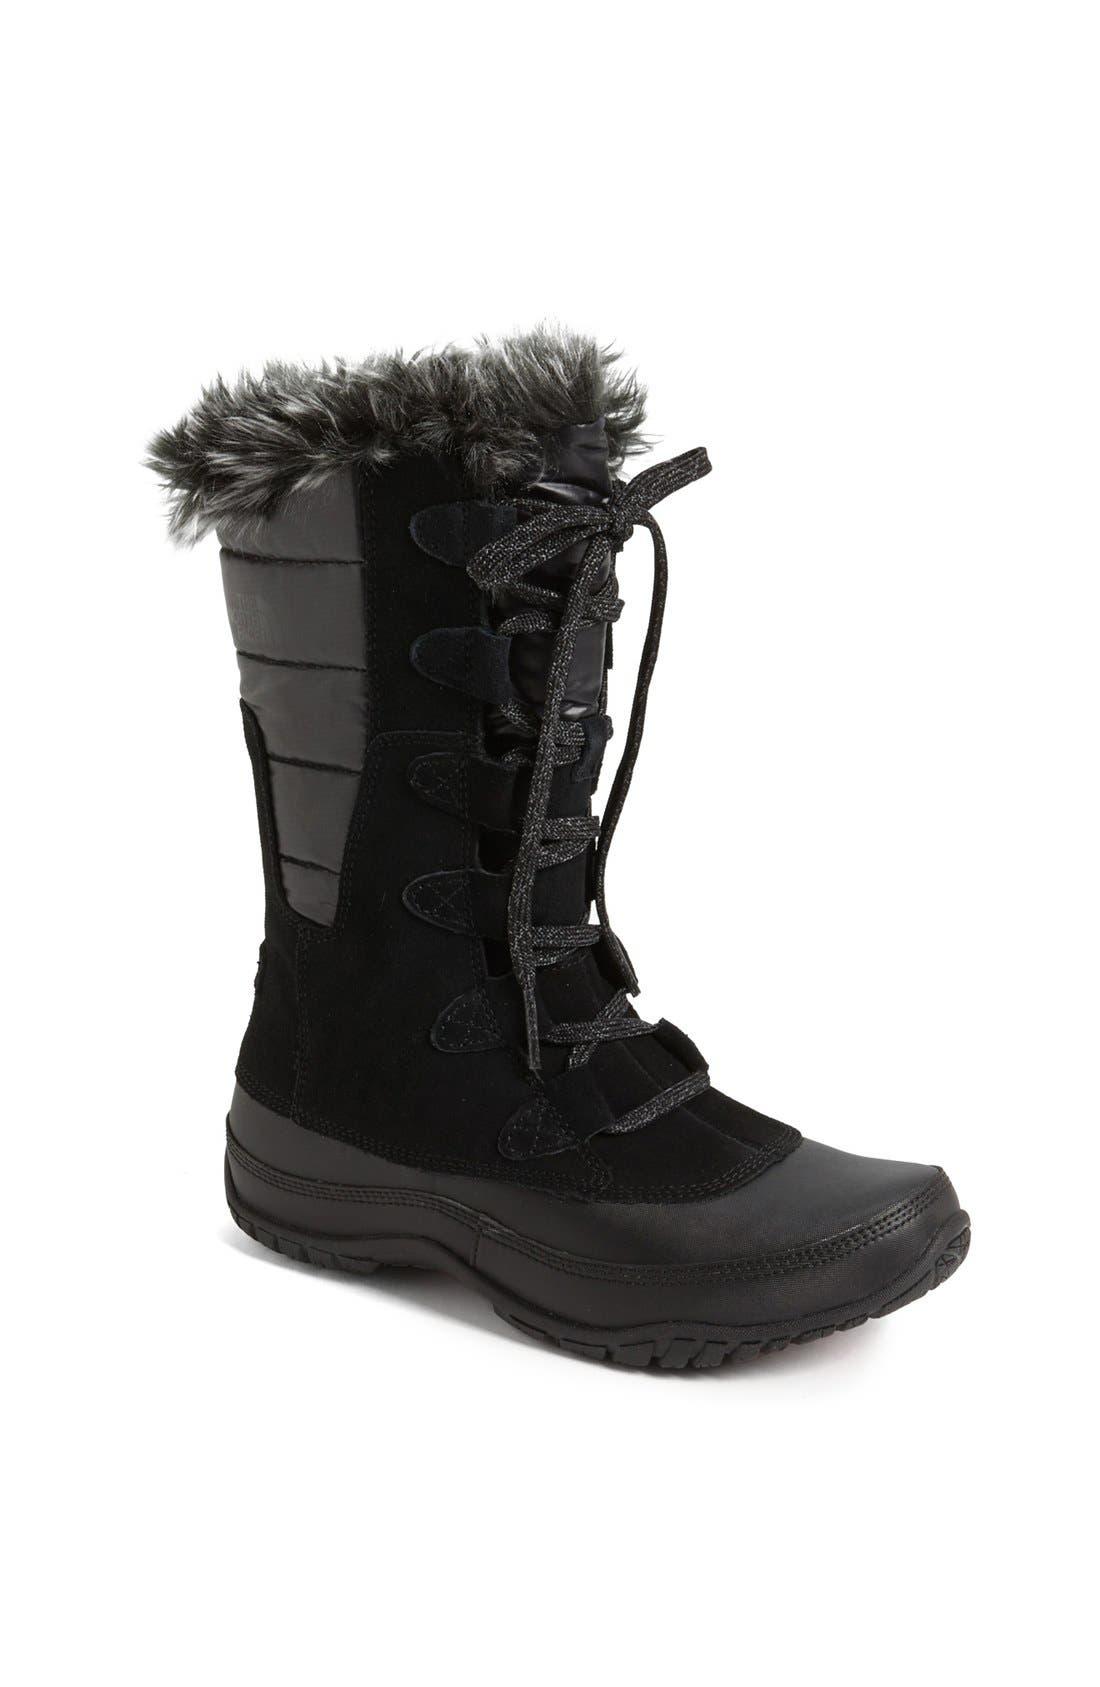 'Nuptse Purna' Waterproof PrimaLoft<sup>®</sup> Eco Insulated Winter Boot,                         Main,                         color, 001